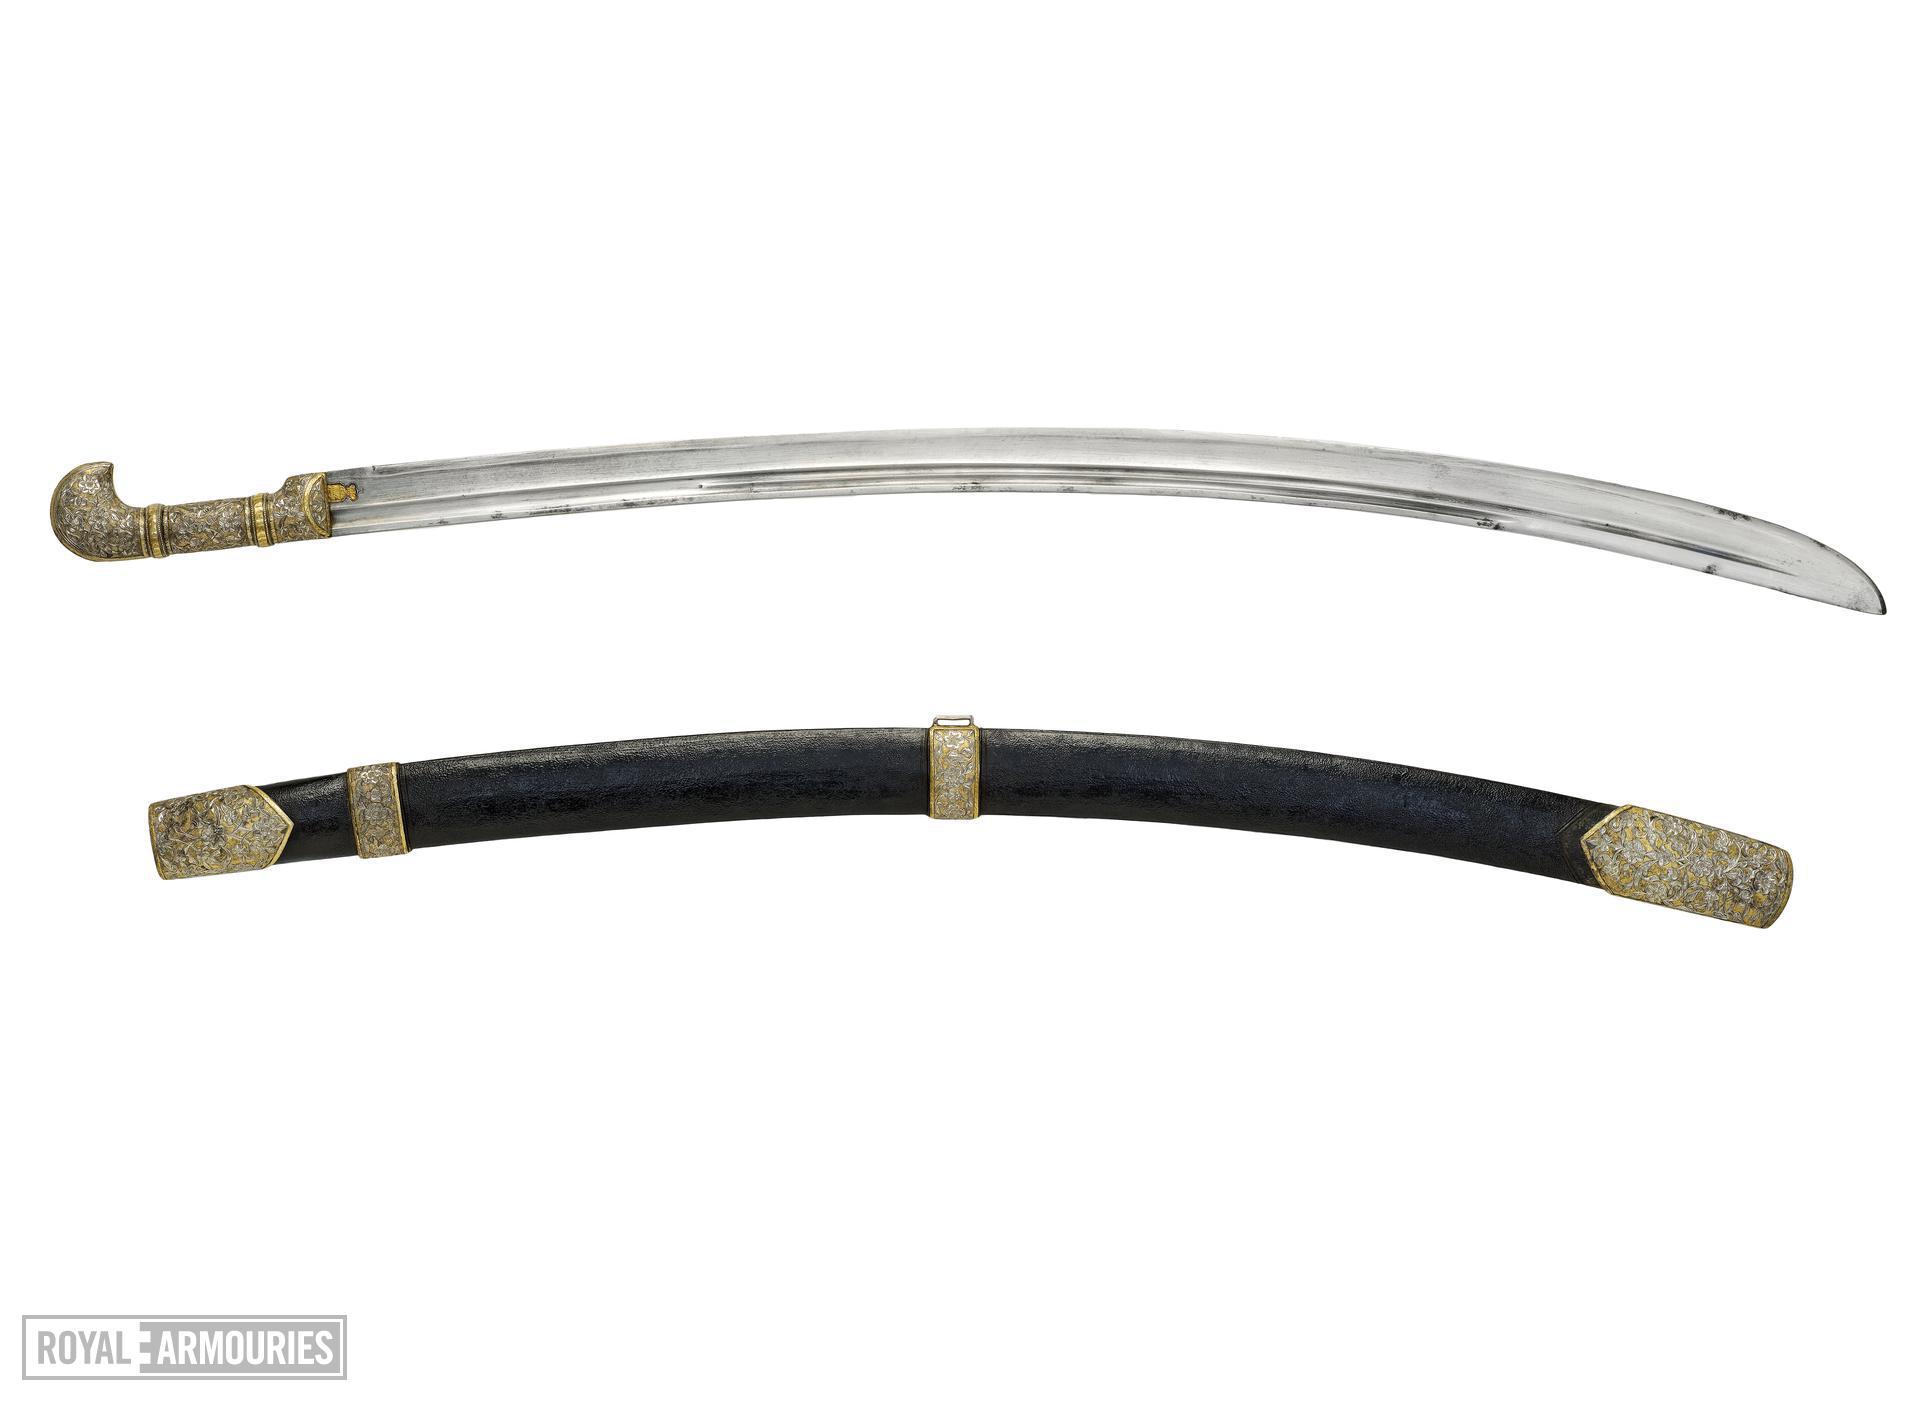 Sword (shashka) and scabbard Shashka and scabbard with silver mounts